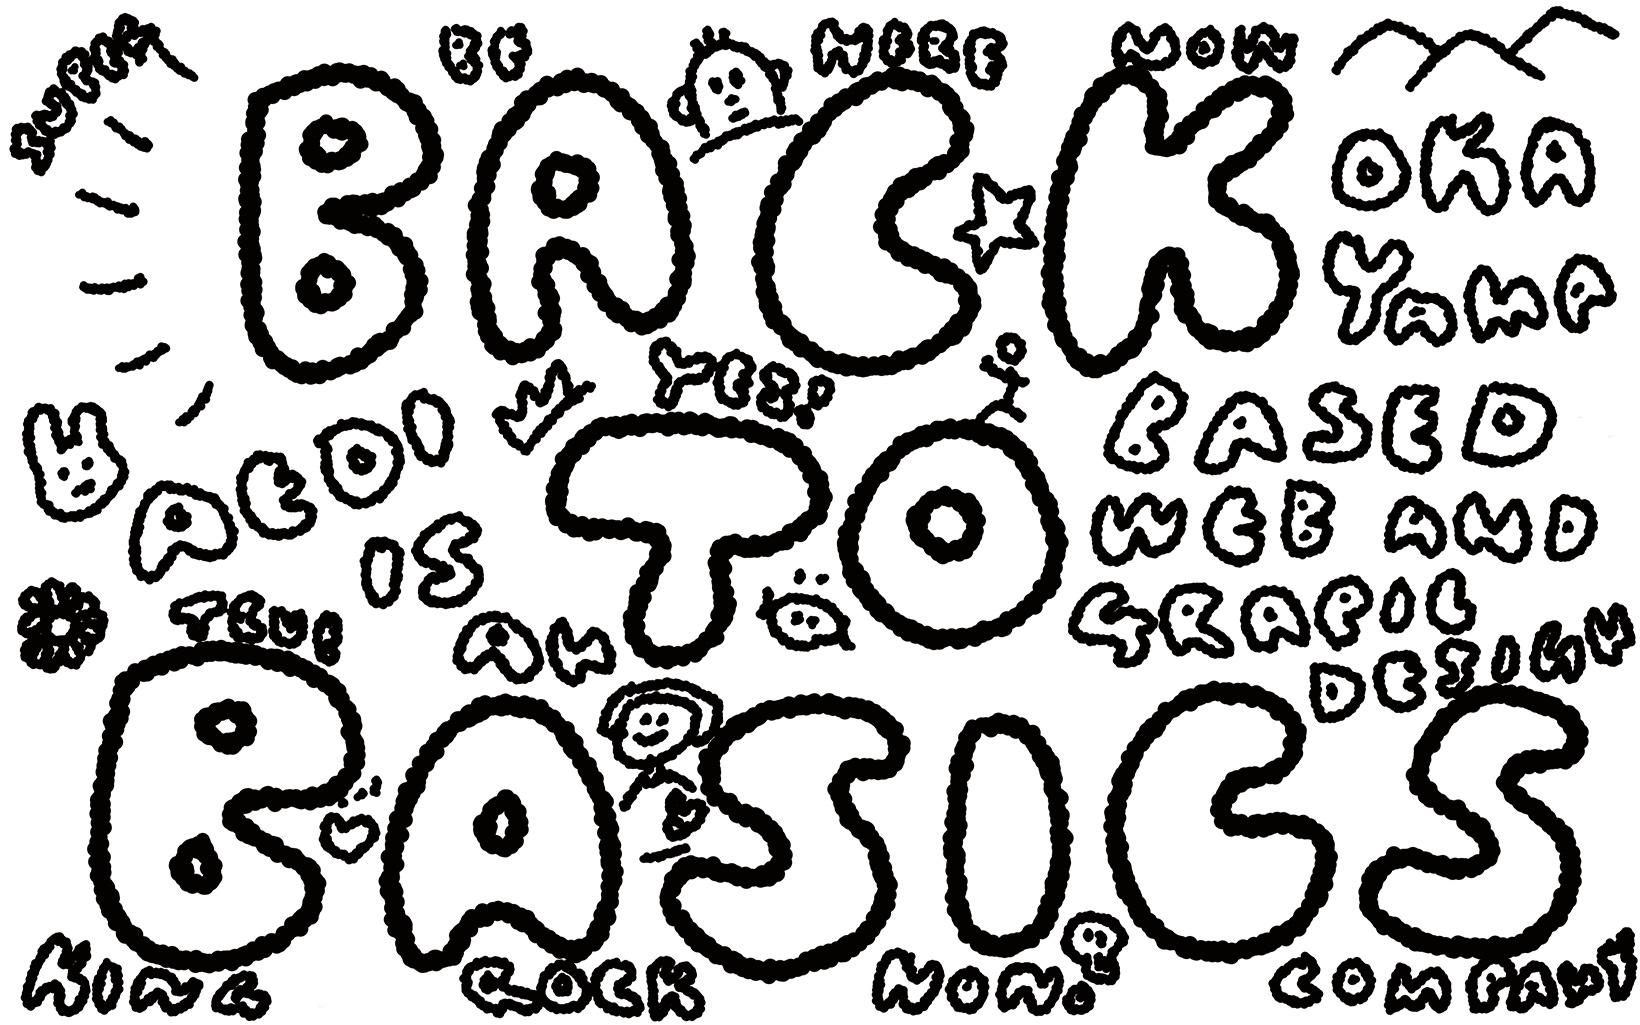 BACK TO BASICS 岡山県倉敷市のホームページ制作会社・デザイン会社 AEDI